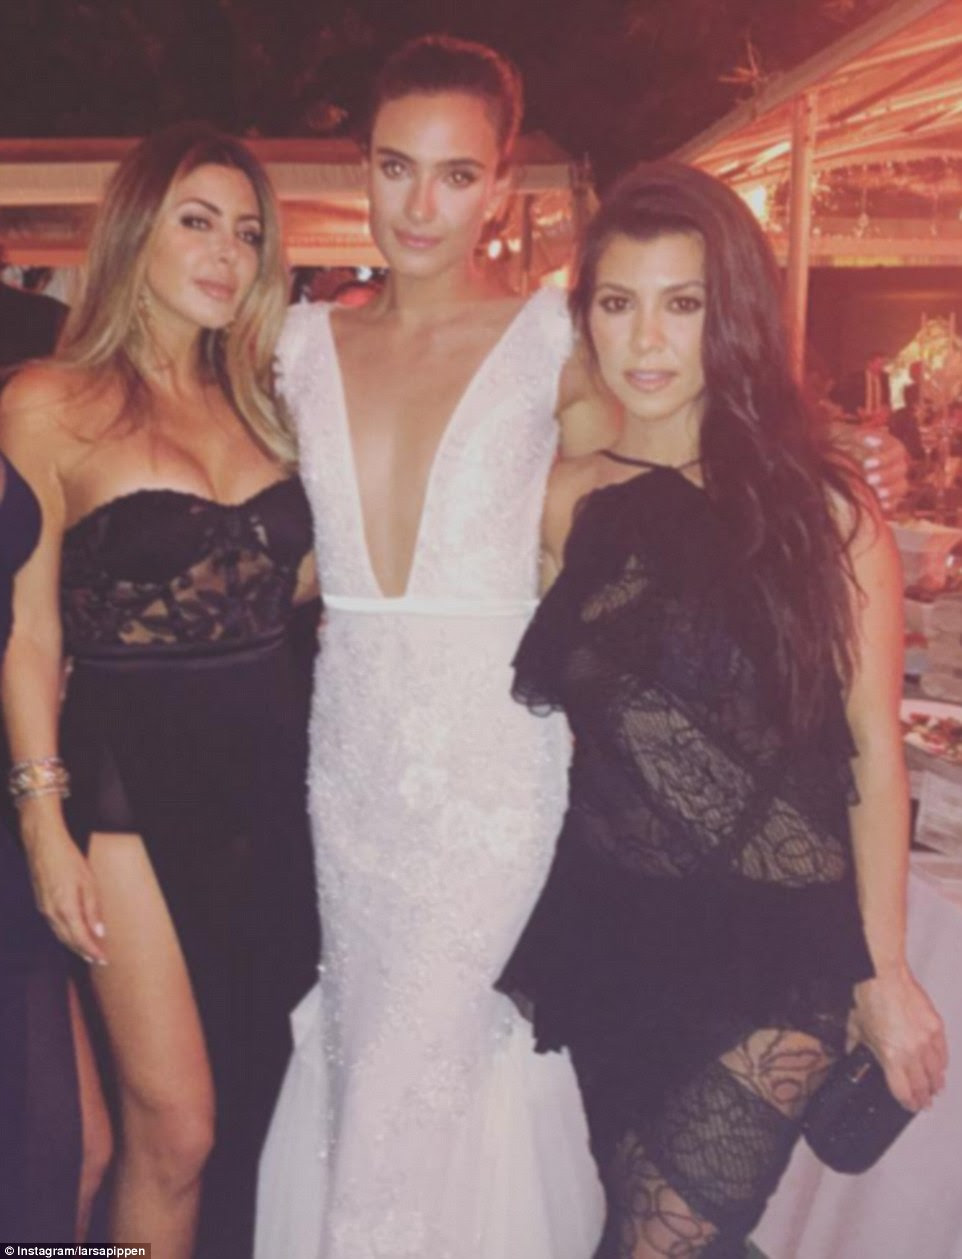 Bride Isabela Rangel pictured with  Larsa Pippen, wife of former NBA star Scottie Pippen, and Kourtney Kardashian